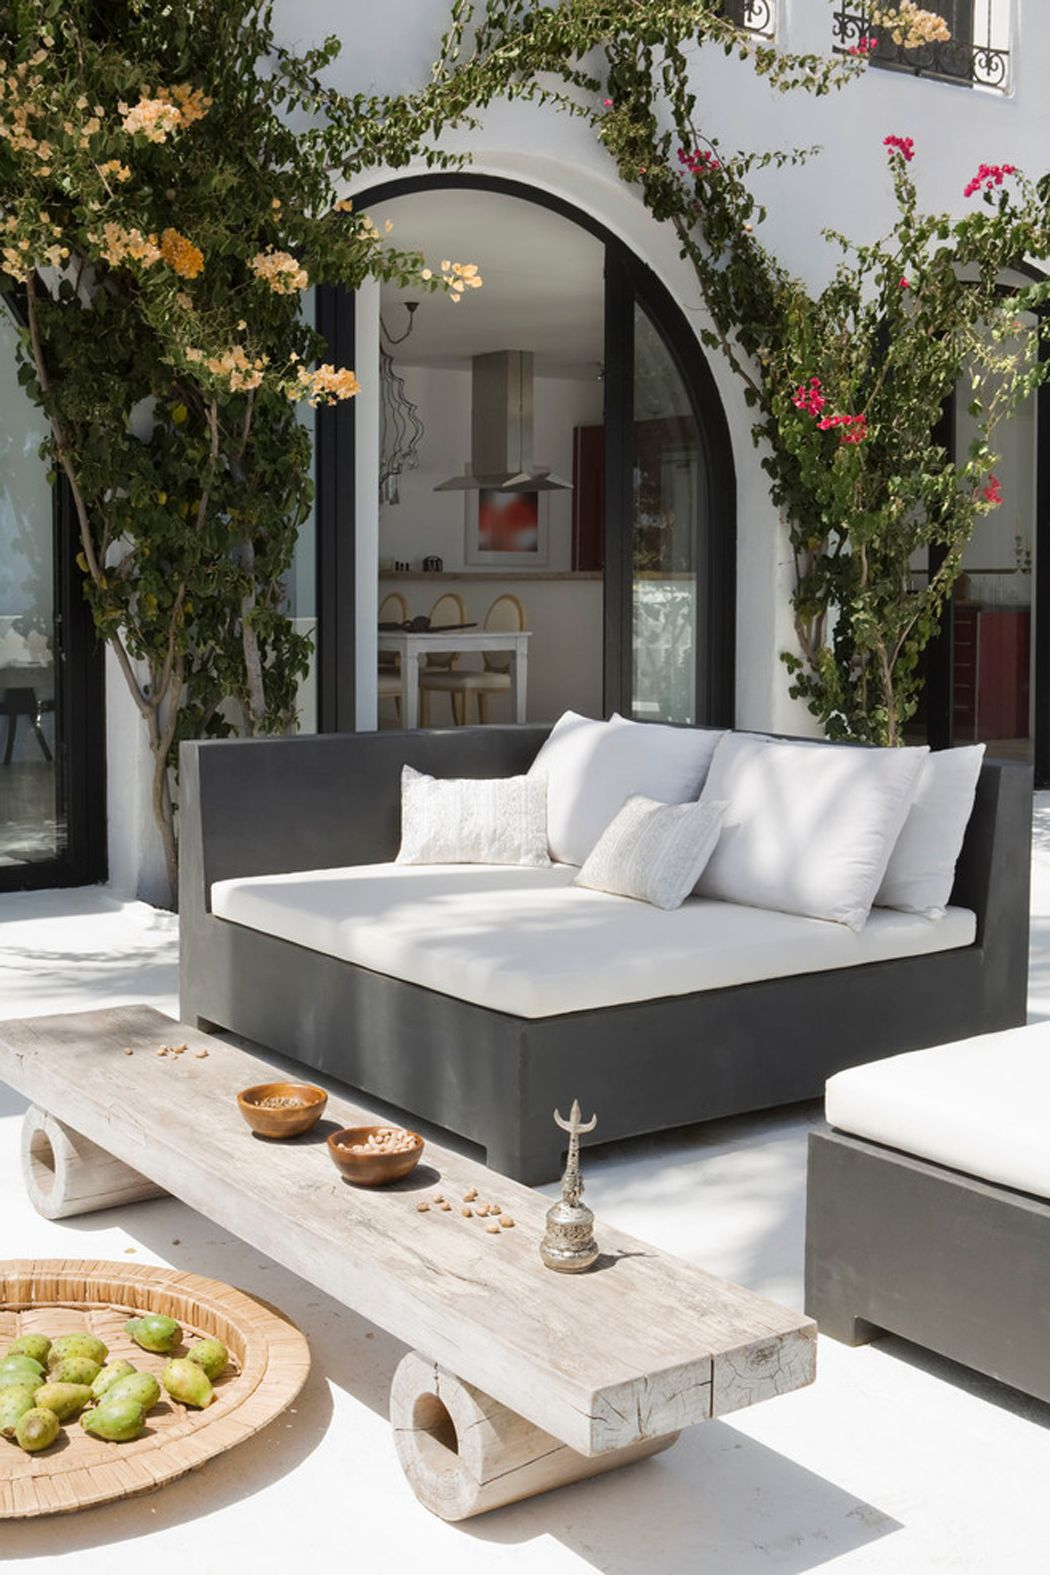 Splendide villa de luxe sur la côte sud espagnole | Balkon, Terassen ...